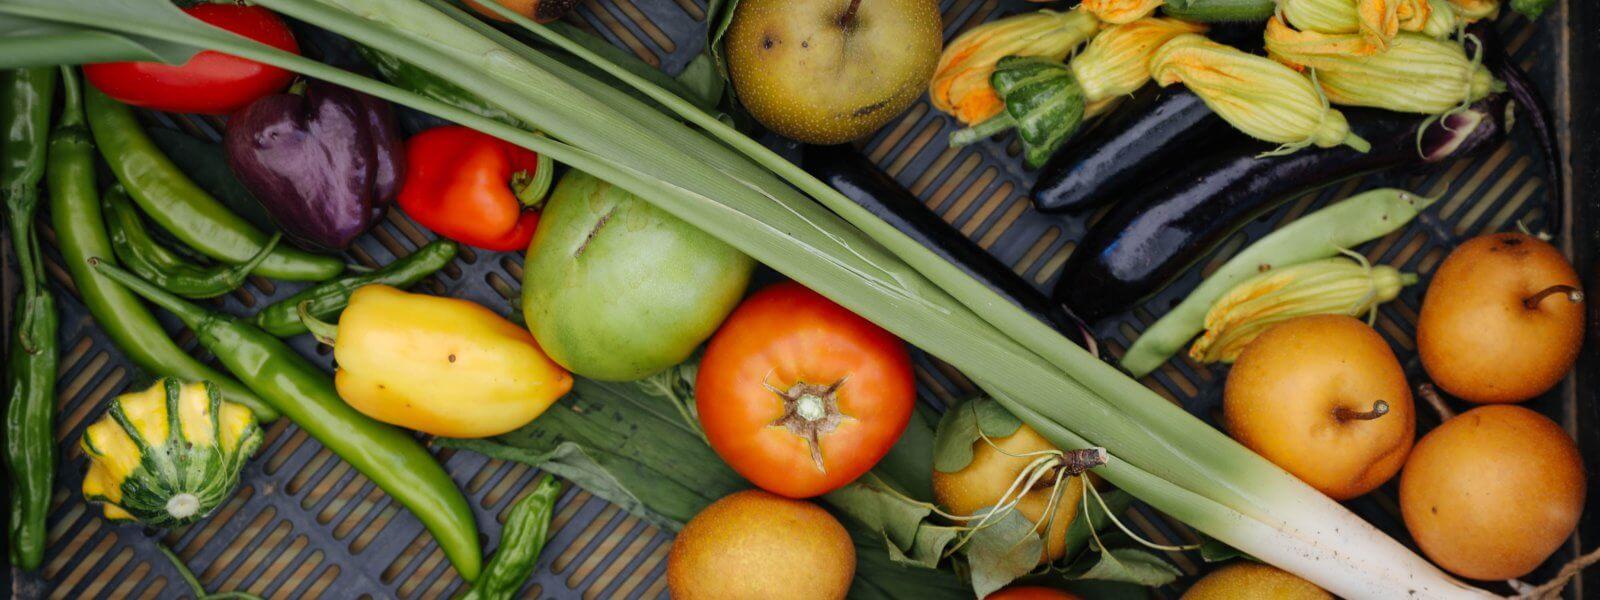 Fall produce.